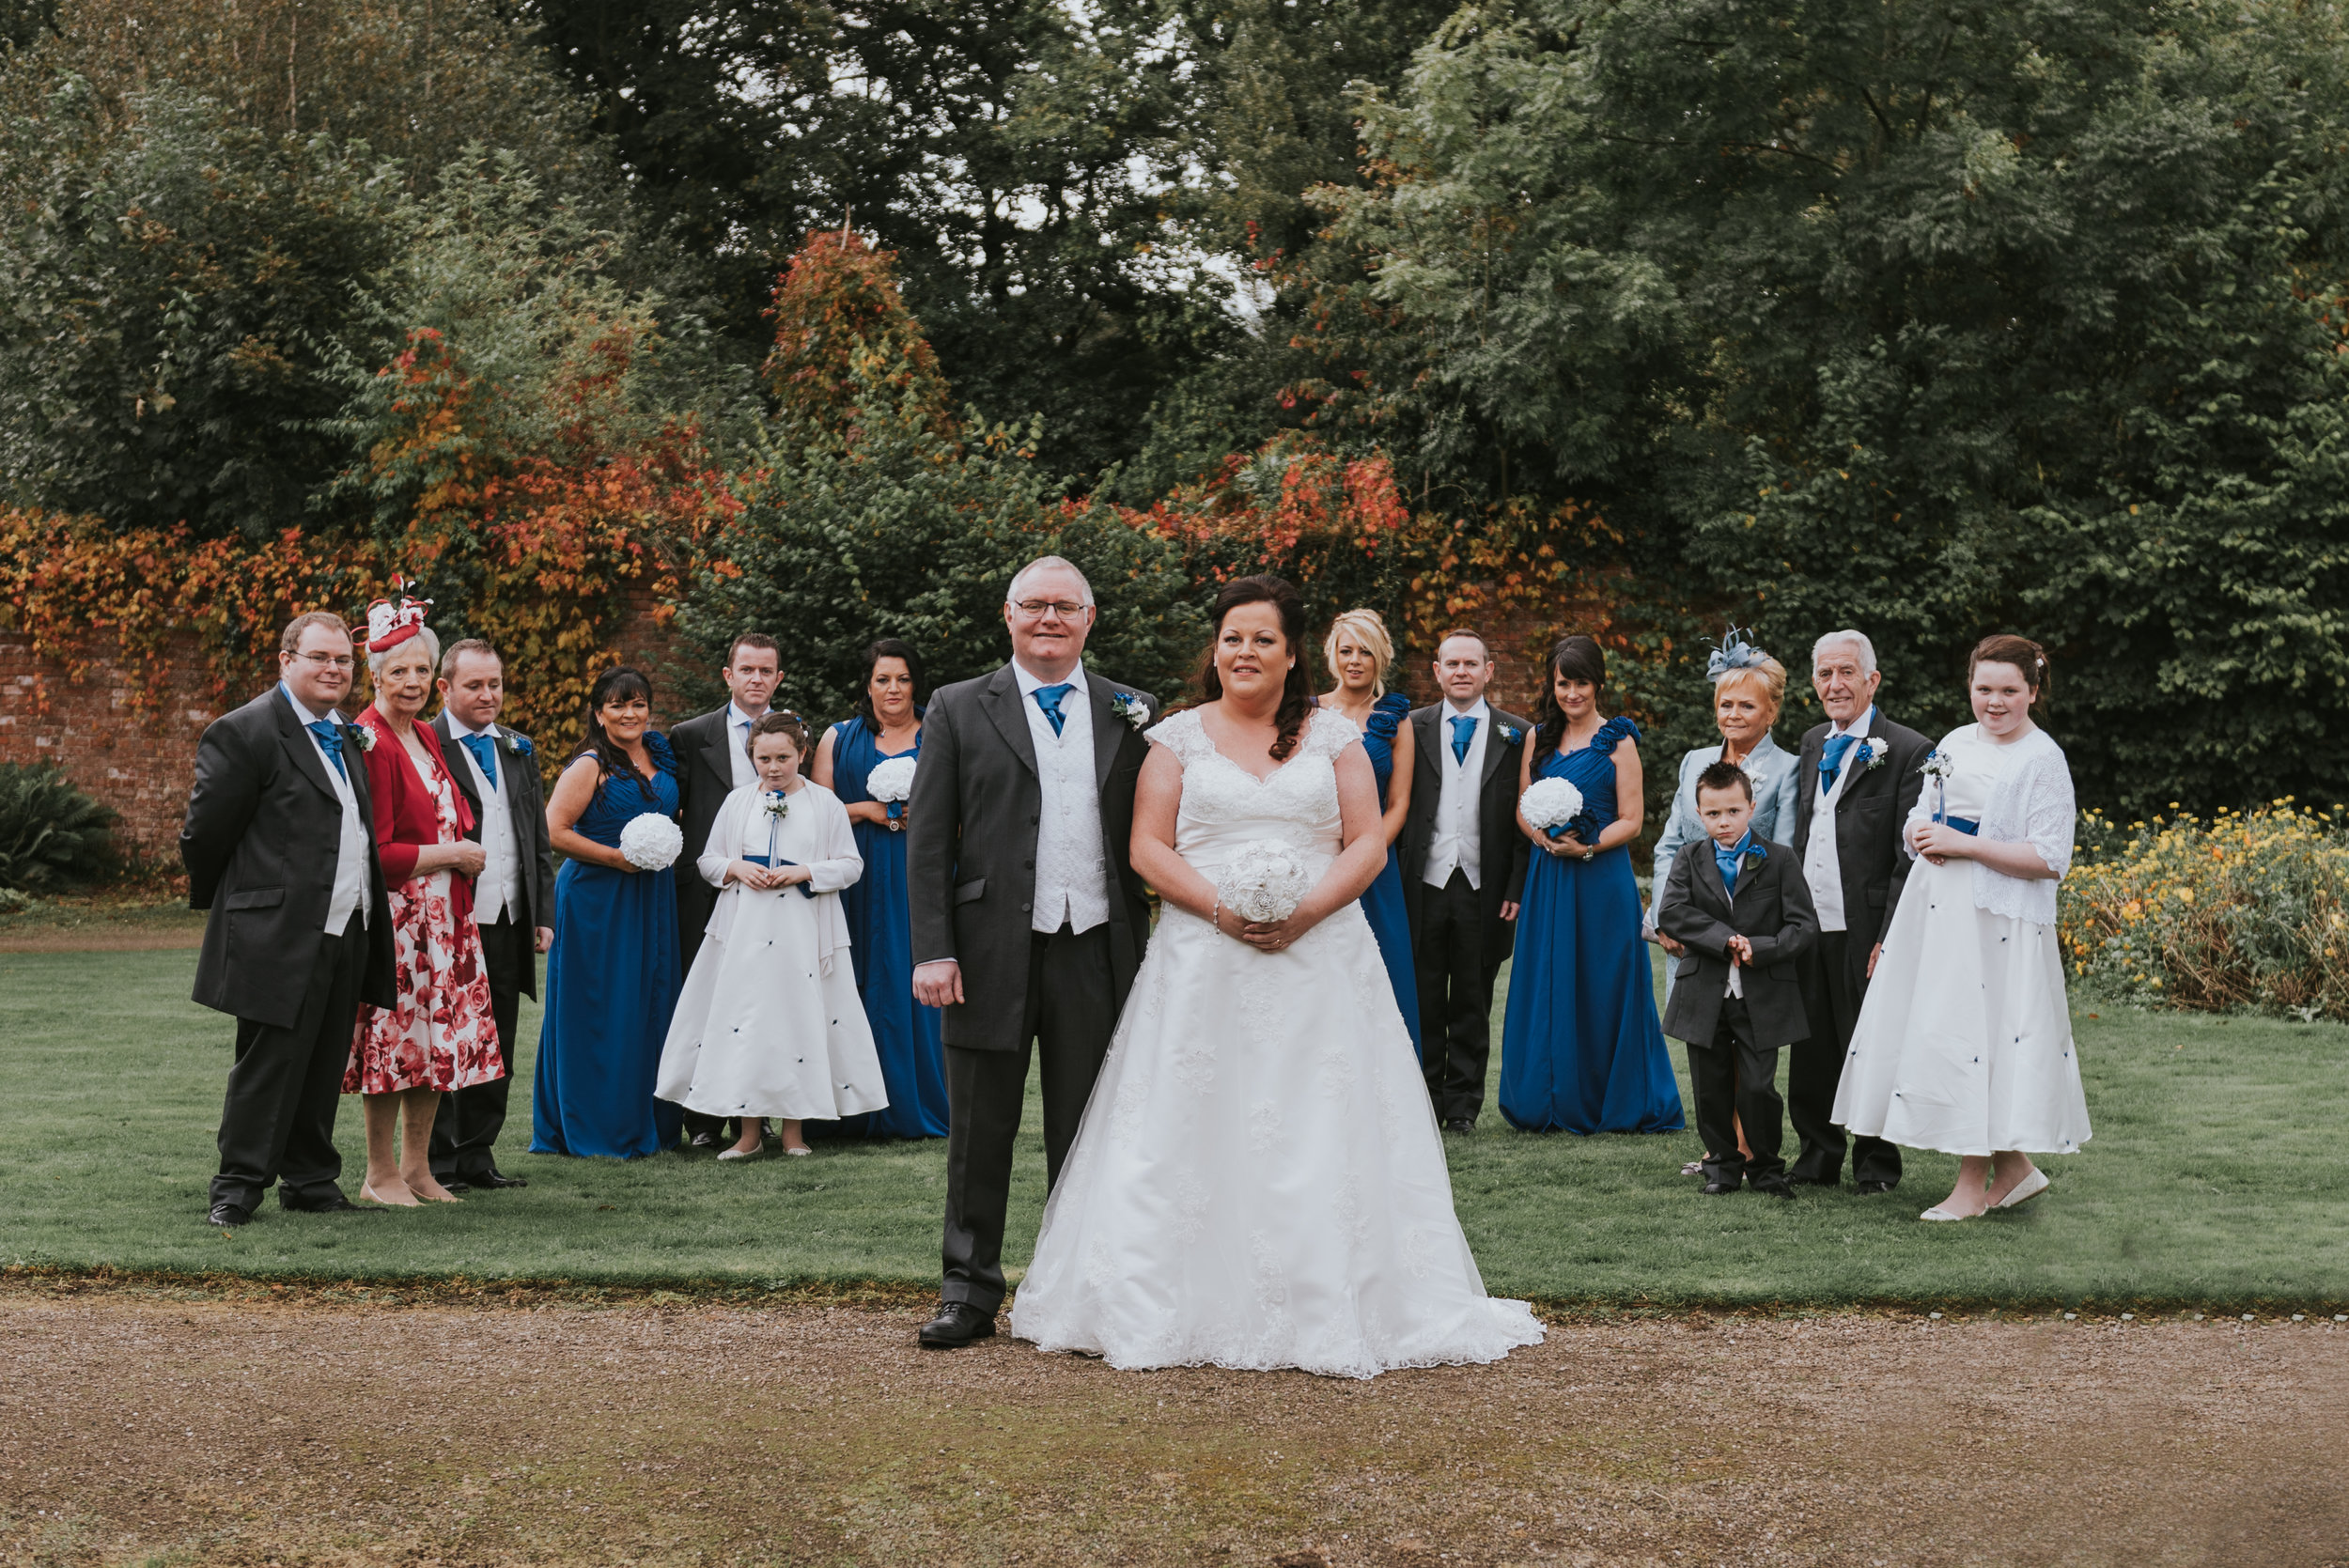 Lady dixon park belfast wedding photographer pure photo n.i family portrait